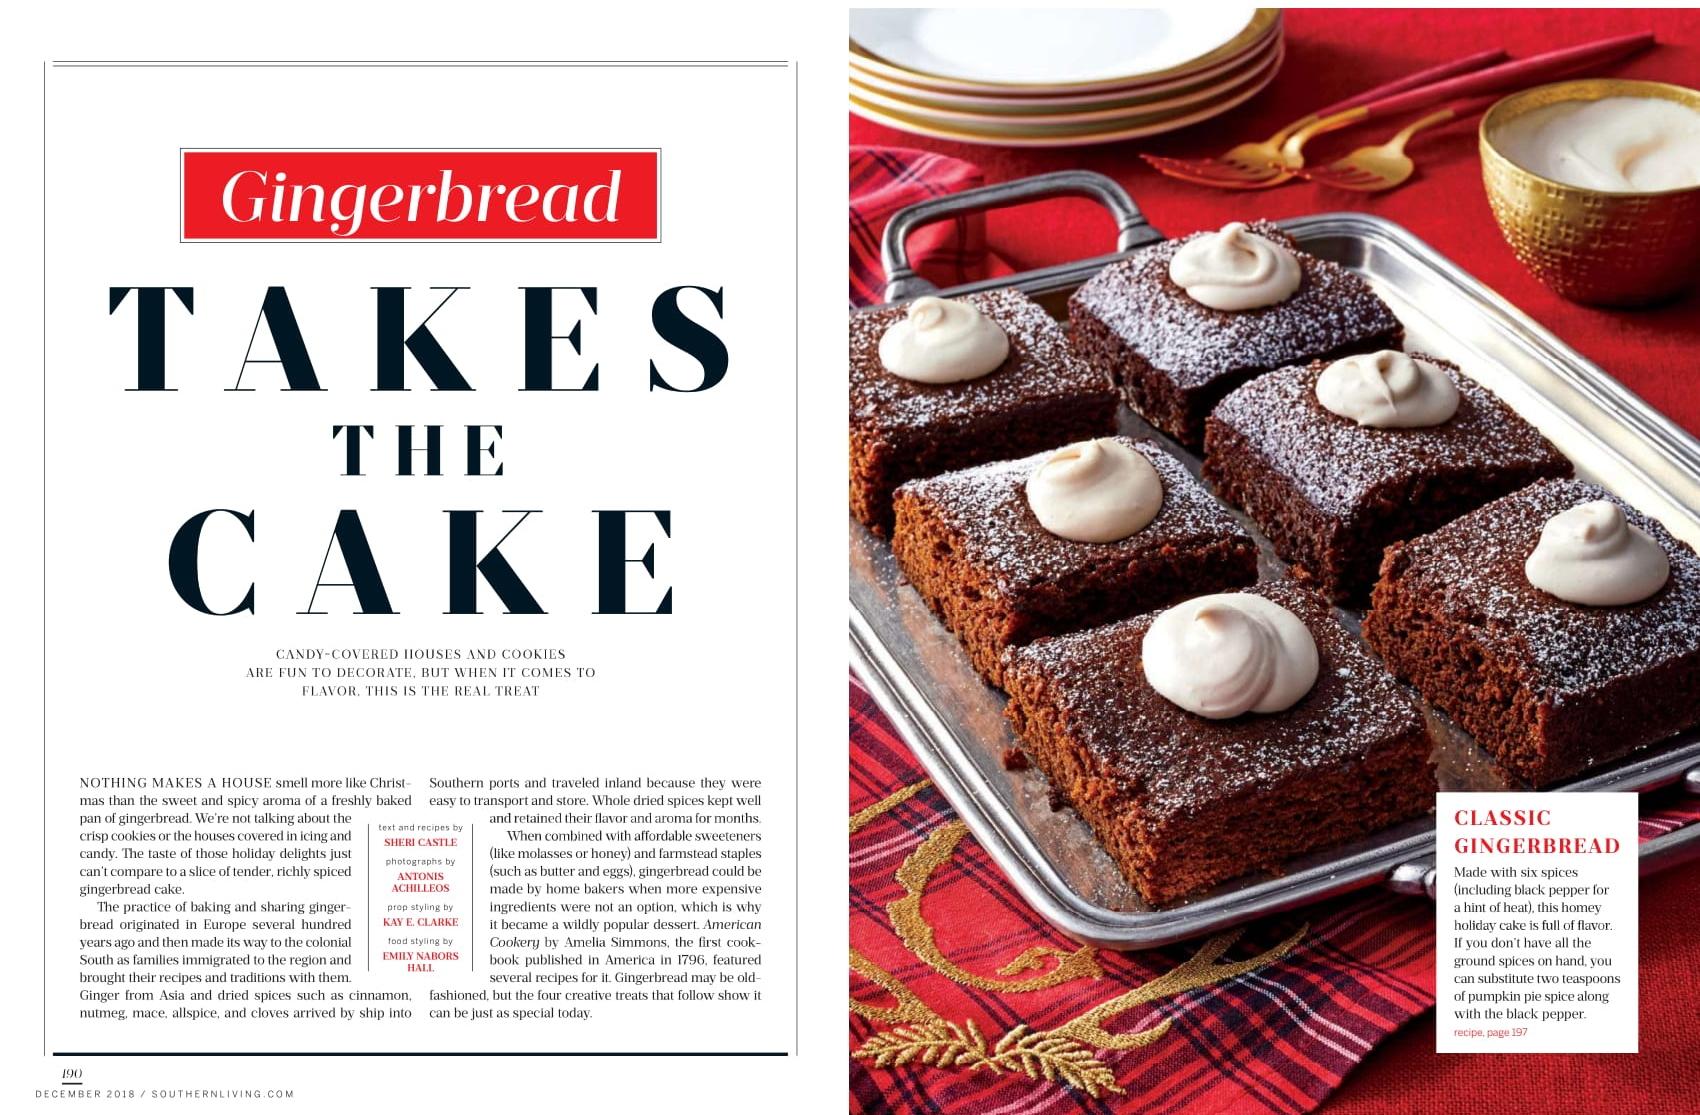 Gingerbread story-1.jpg